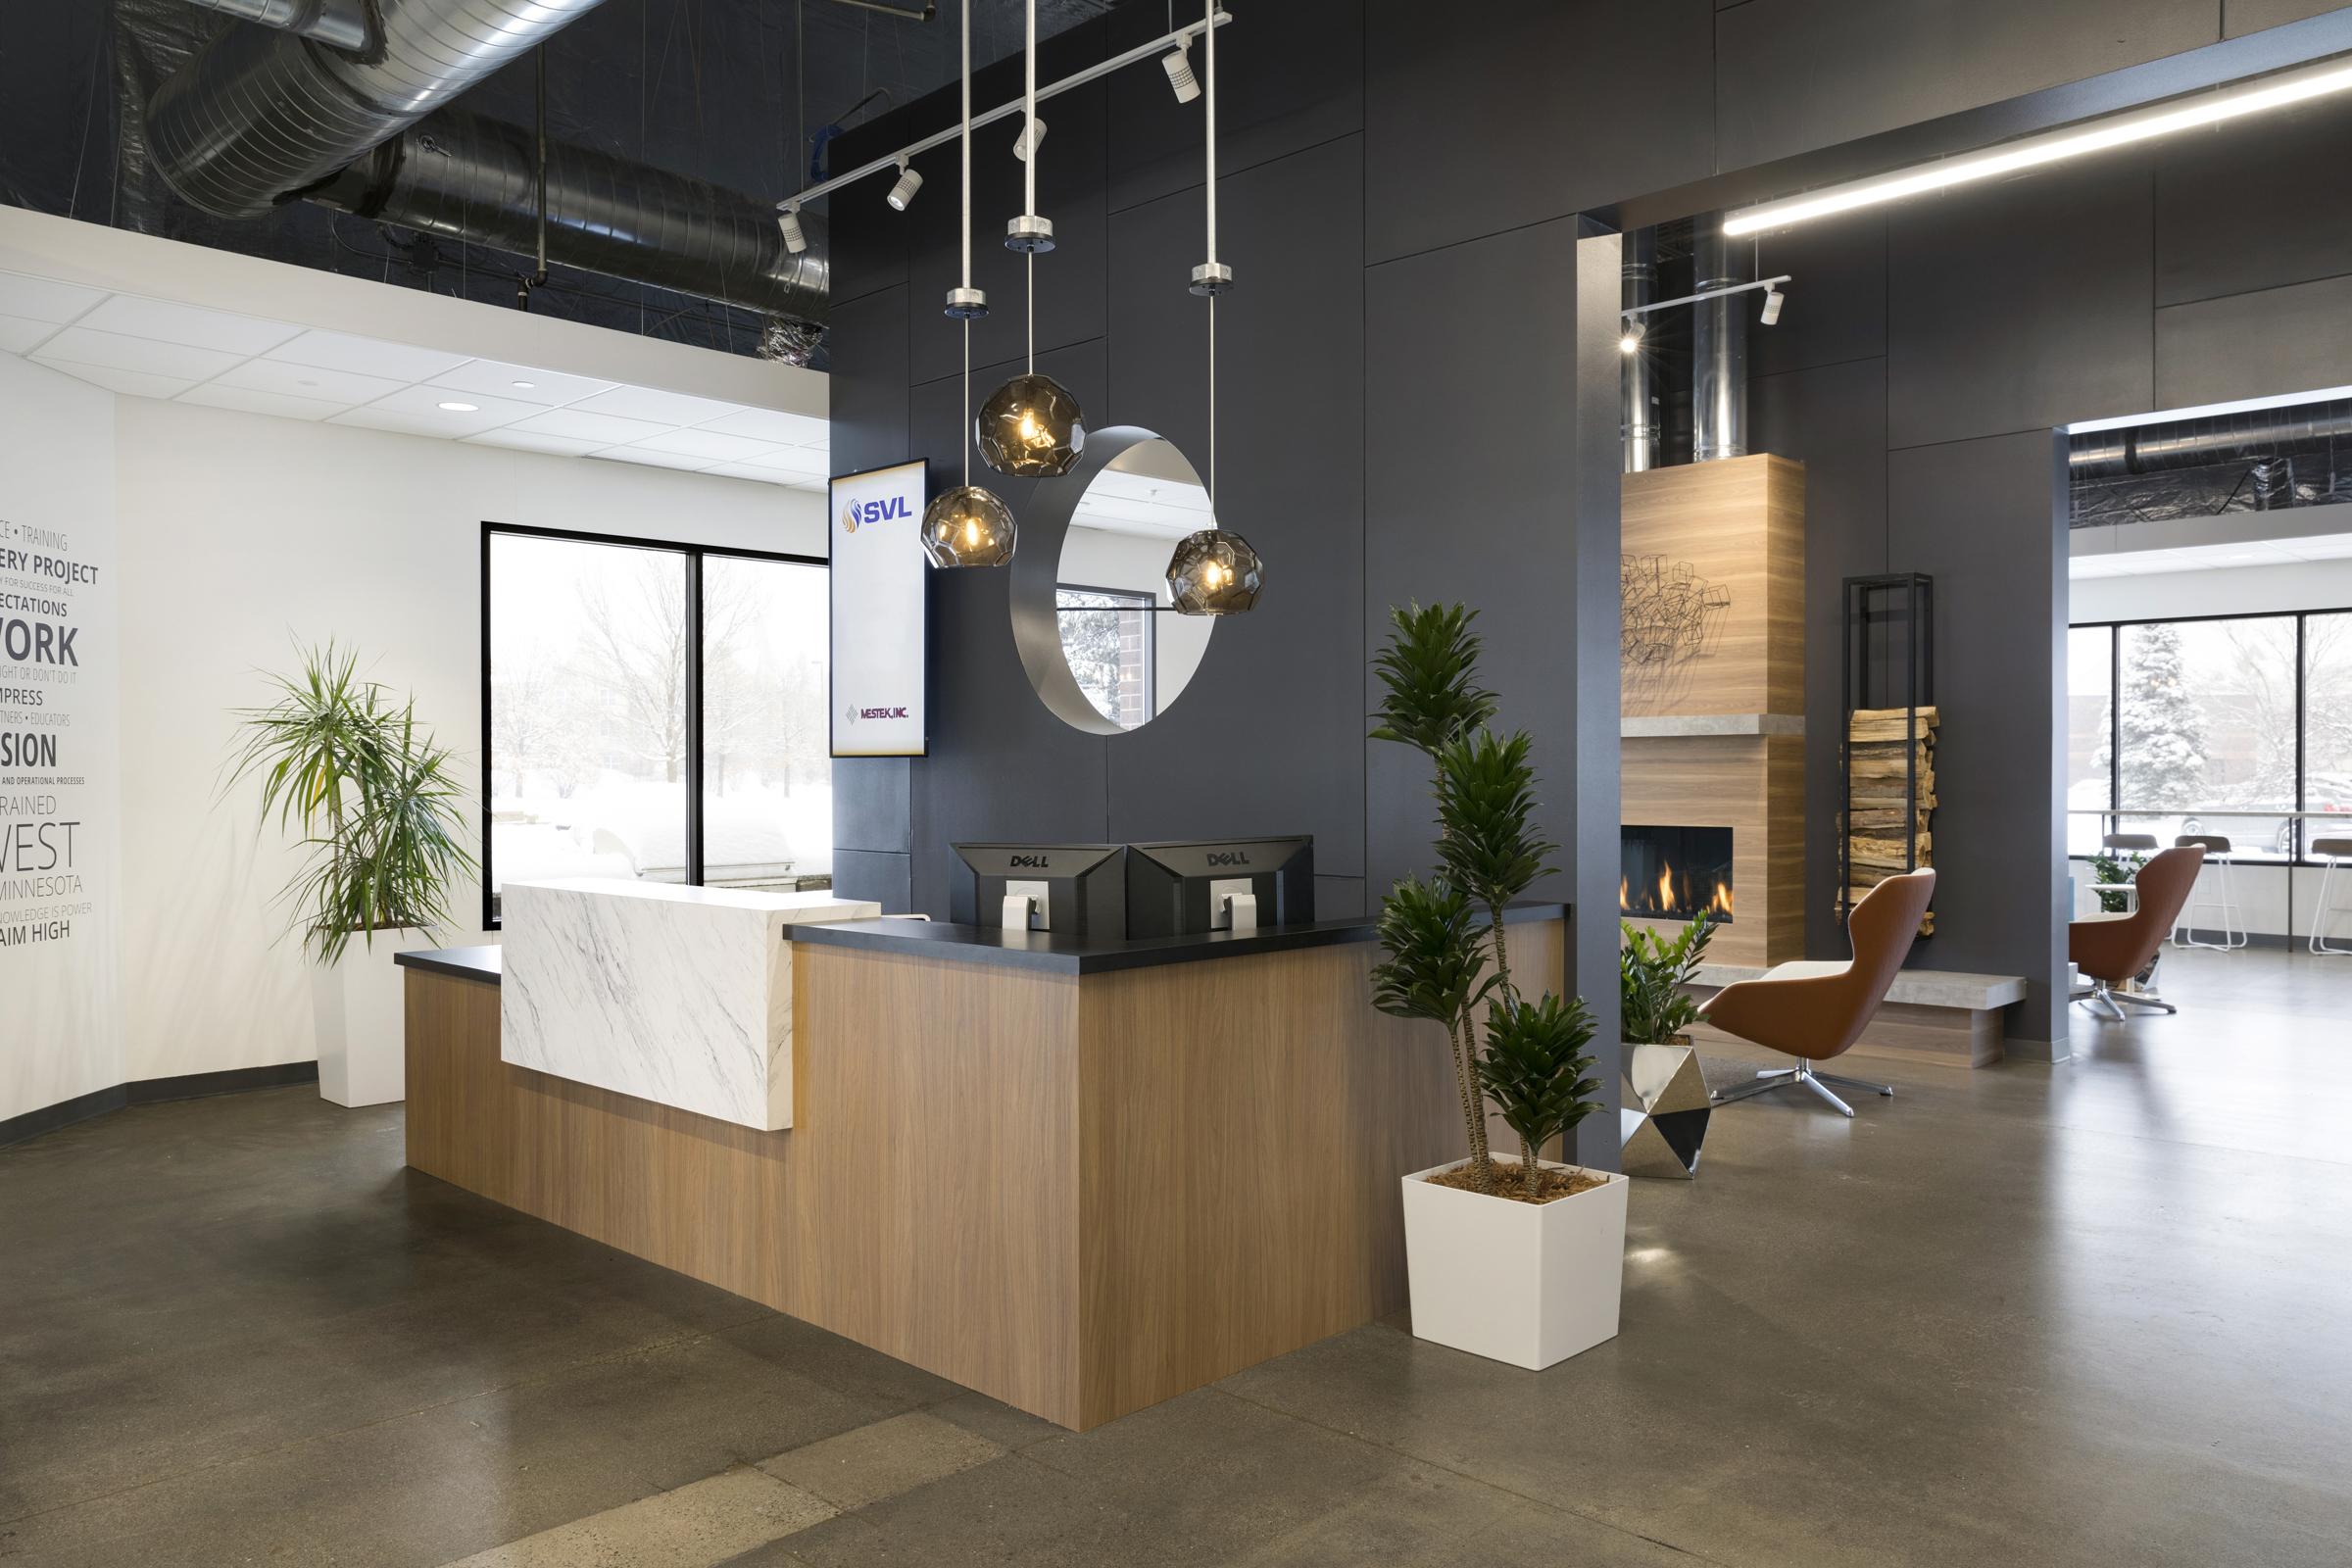 SVL Reception | Vela Creative Interior Design